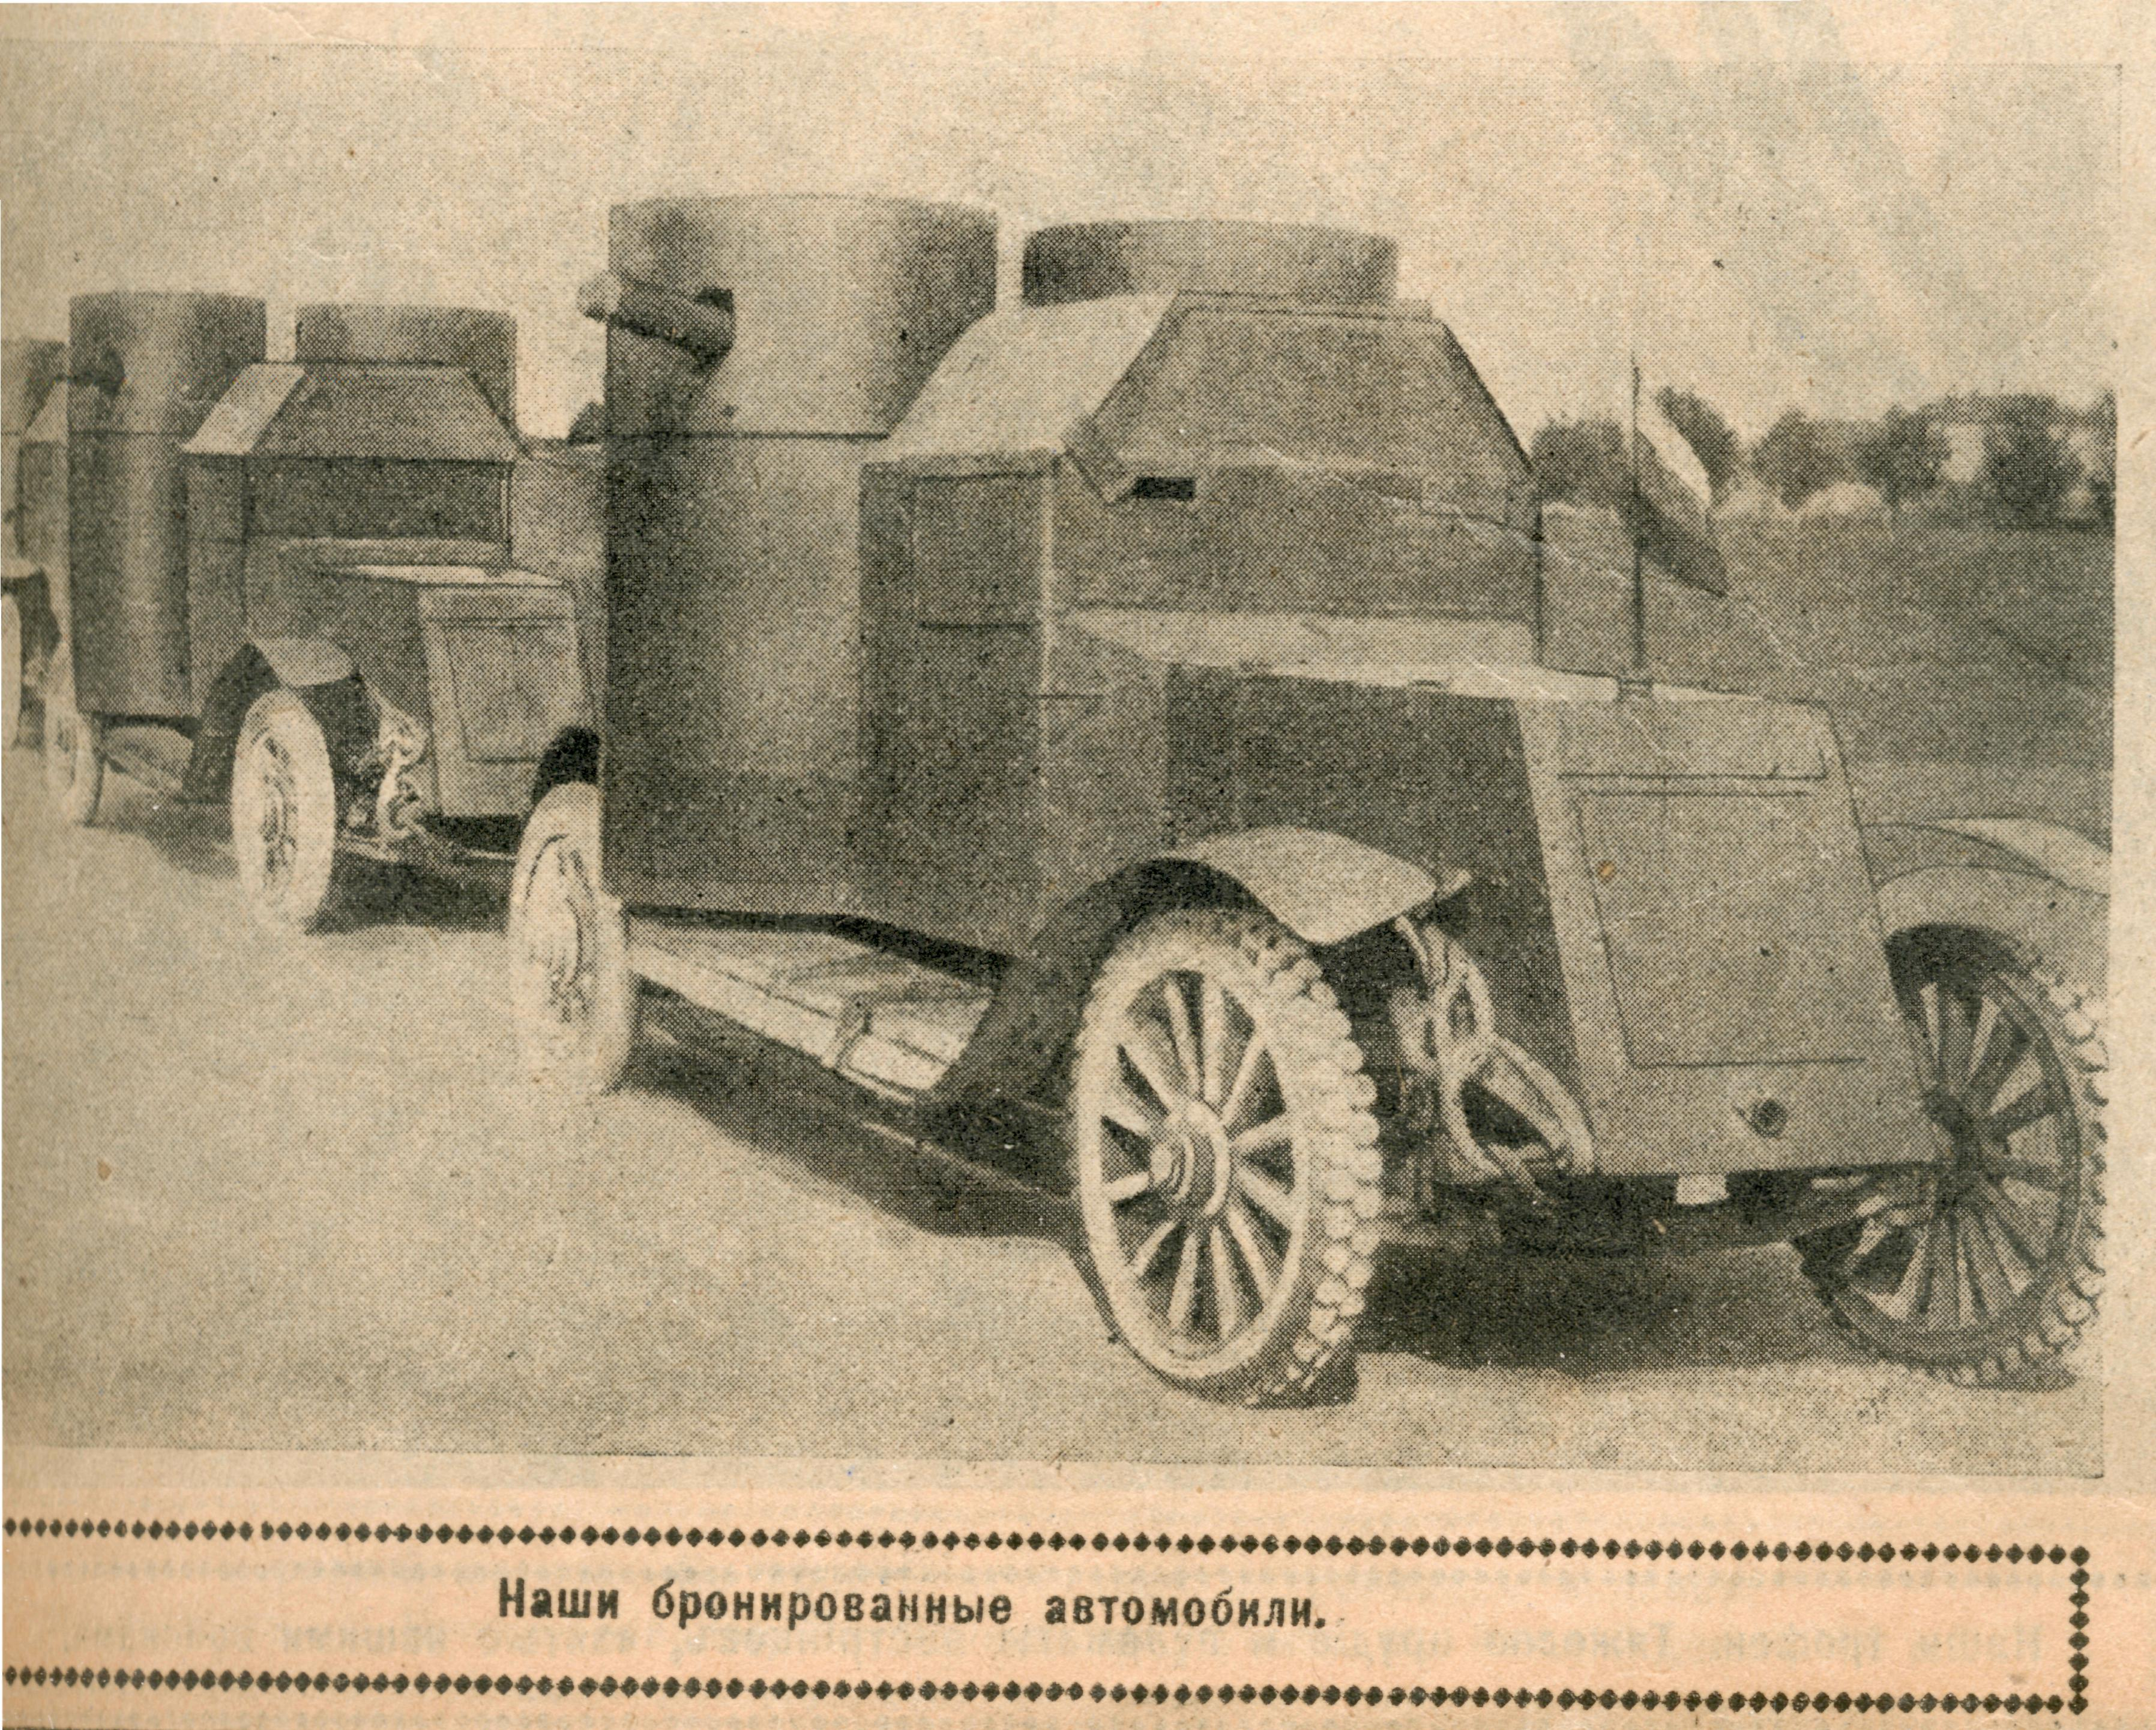 Austin 1st serie, Neva, 1916.